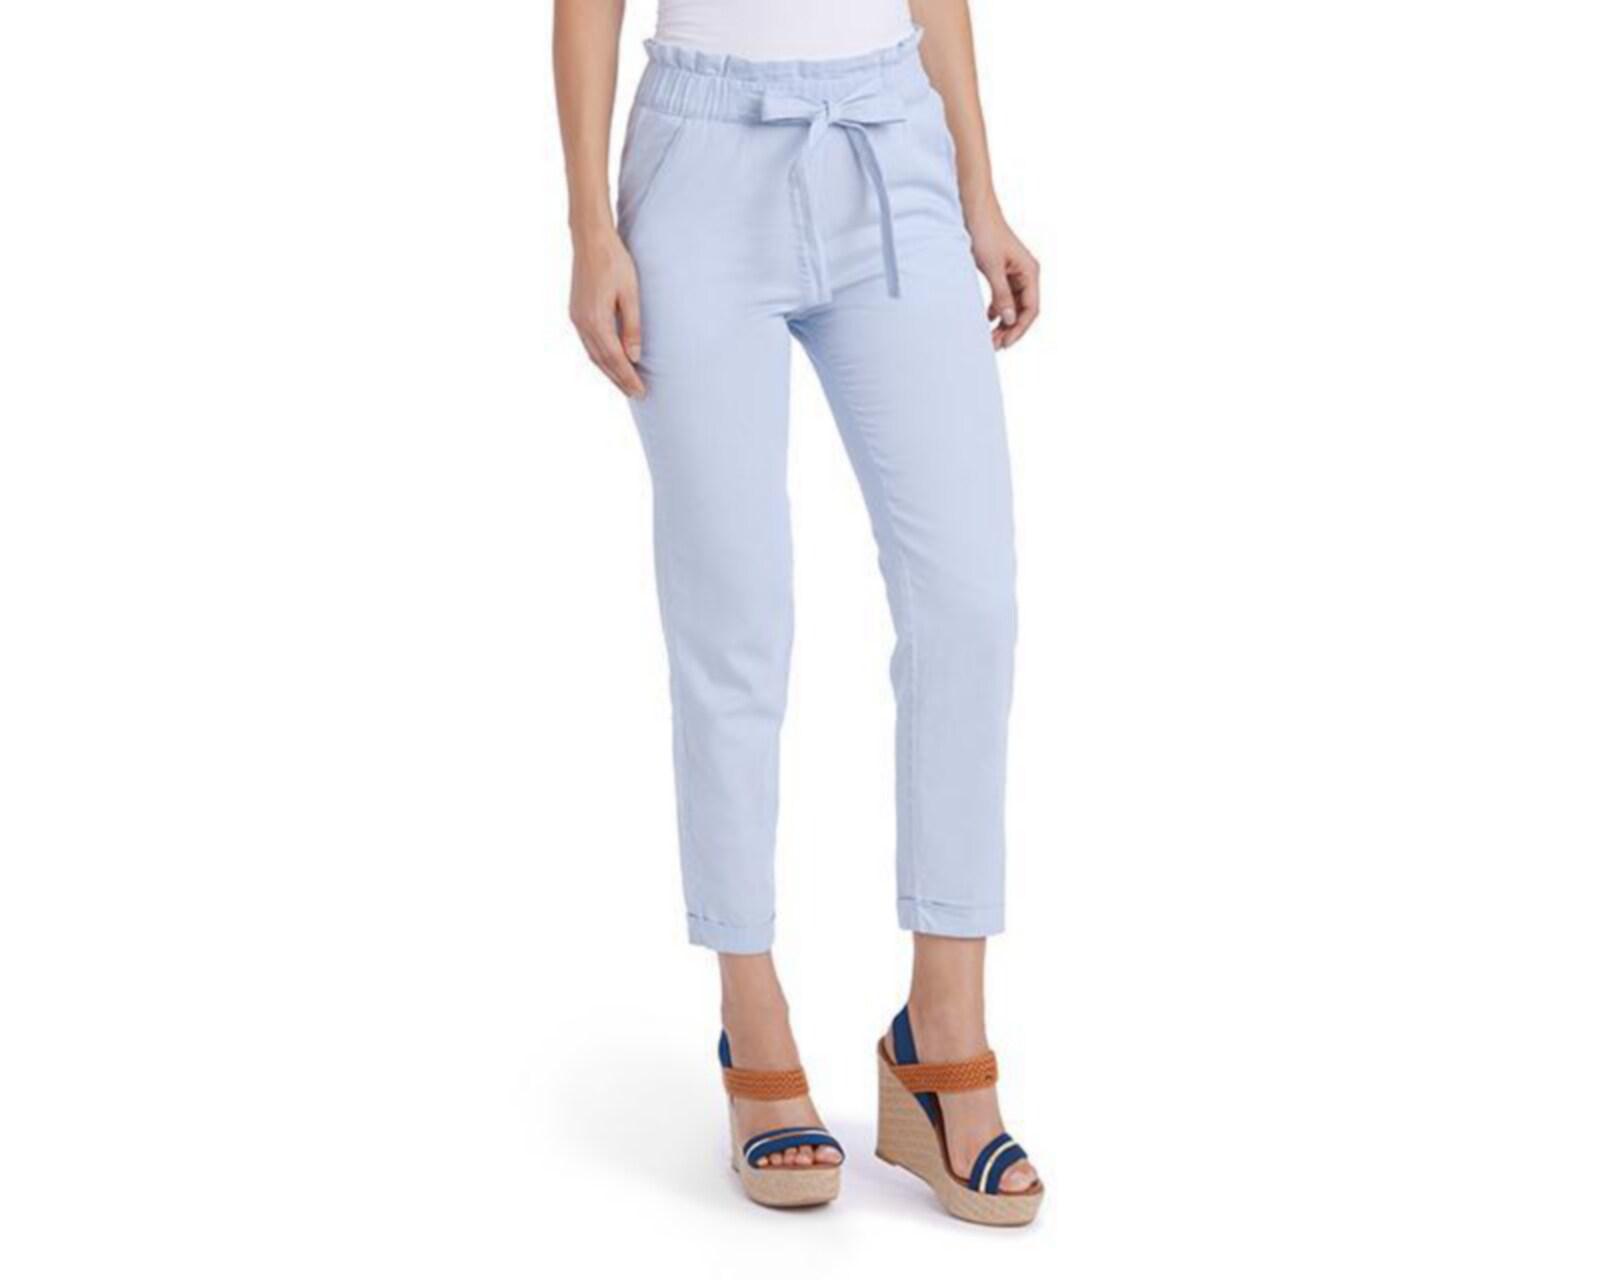 Pantalón Casual para Mujer Jennifer Lopez